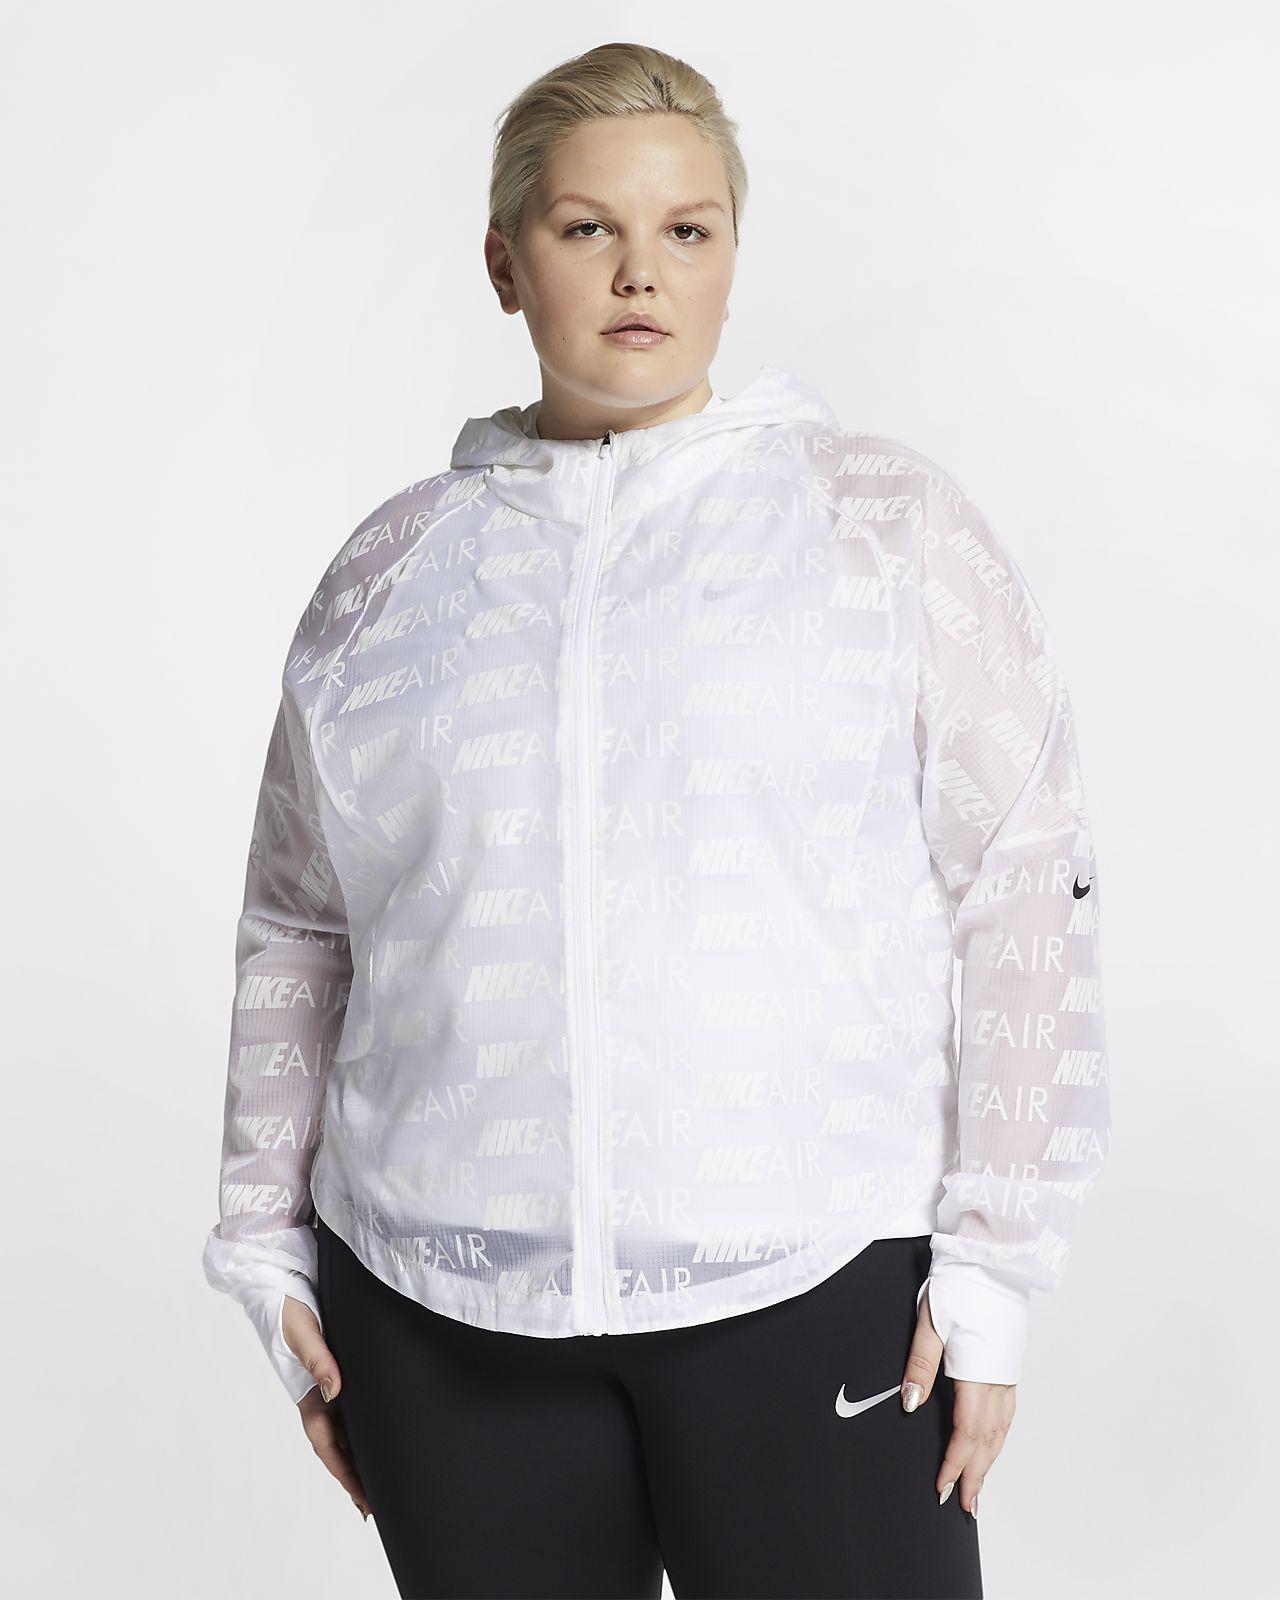 Nike Air Damen-Laufjacke mit Kapuze (große Größe)